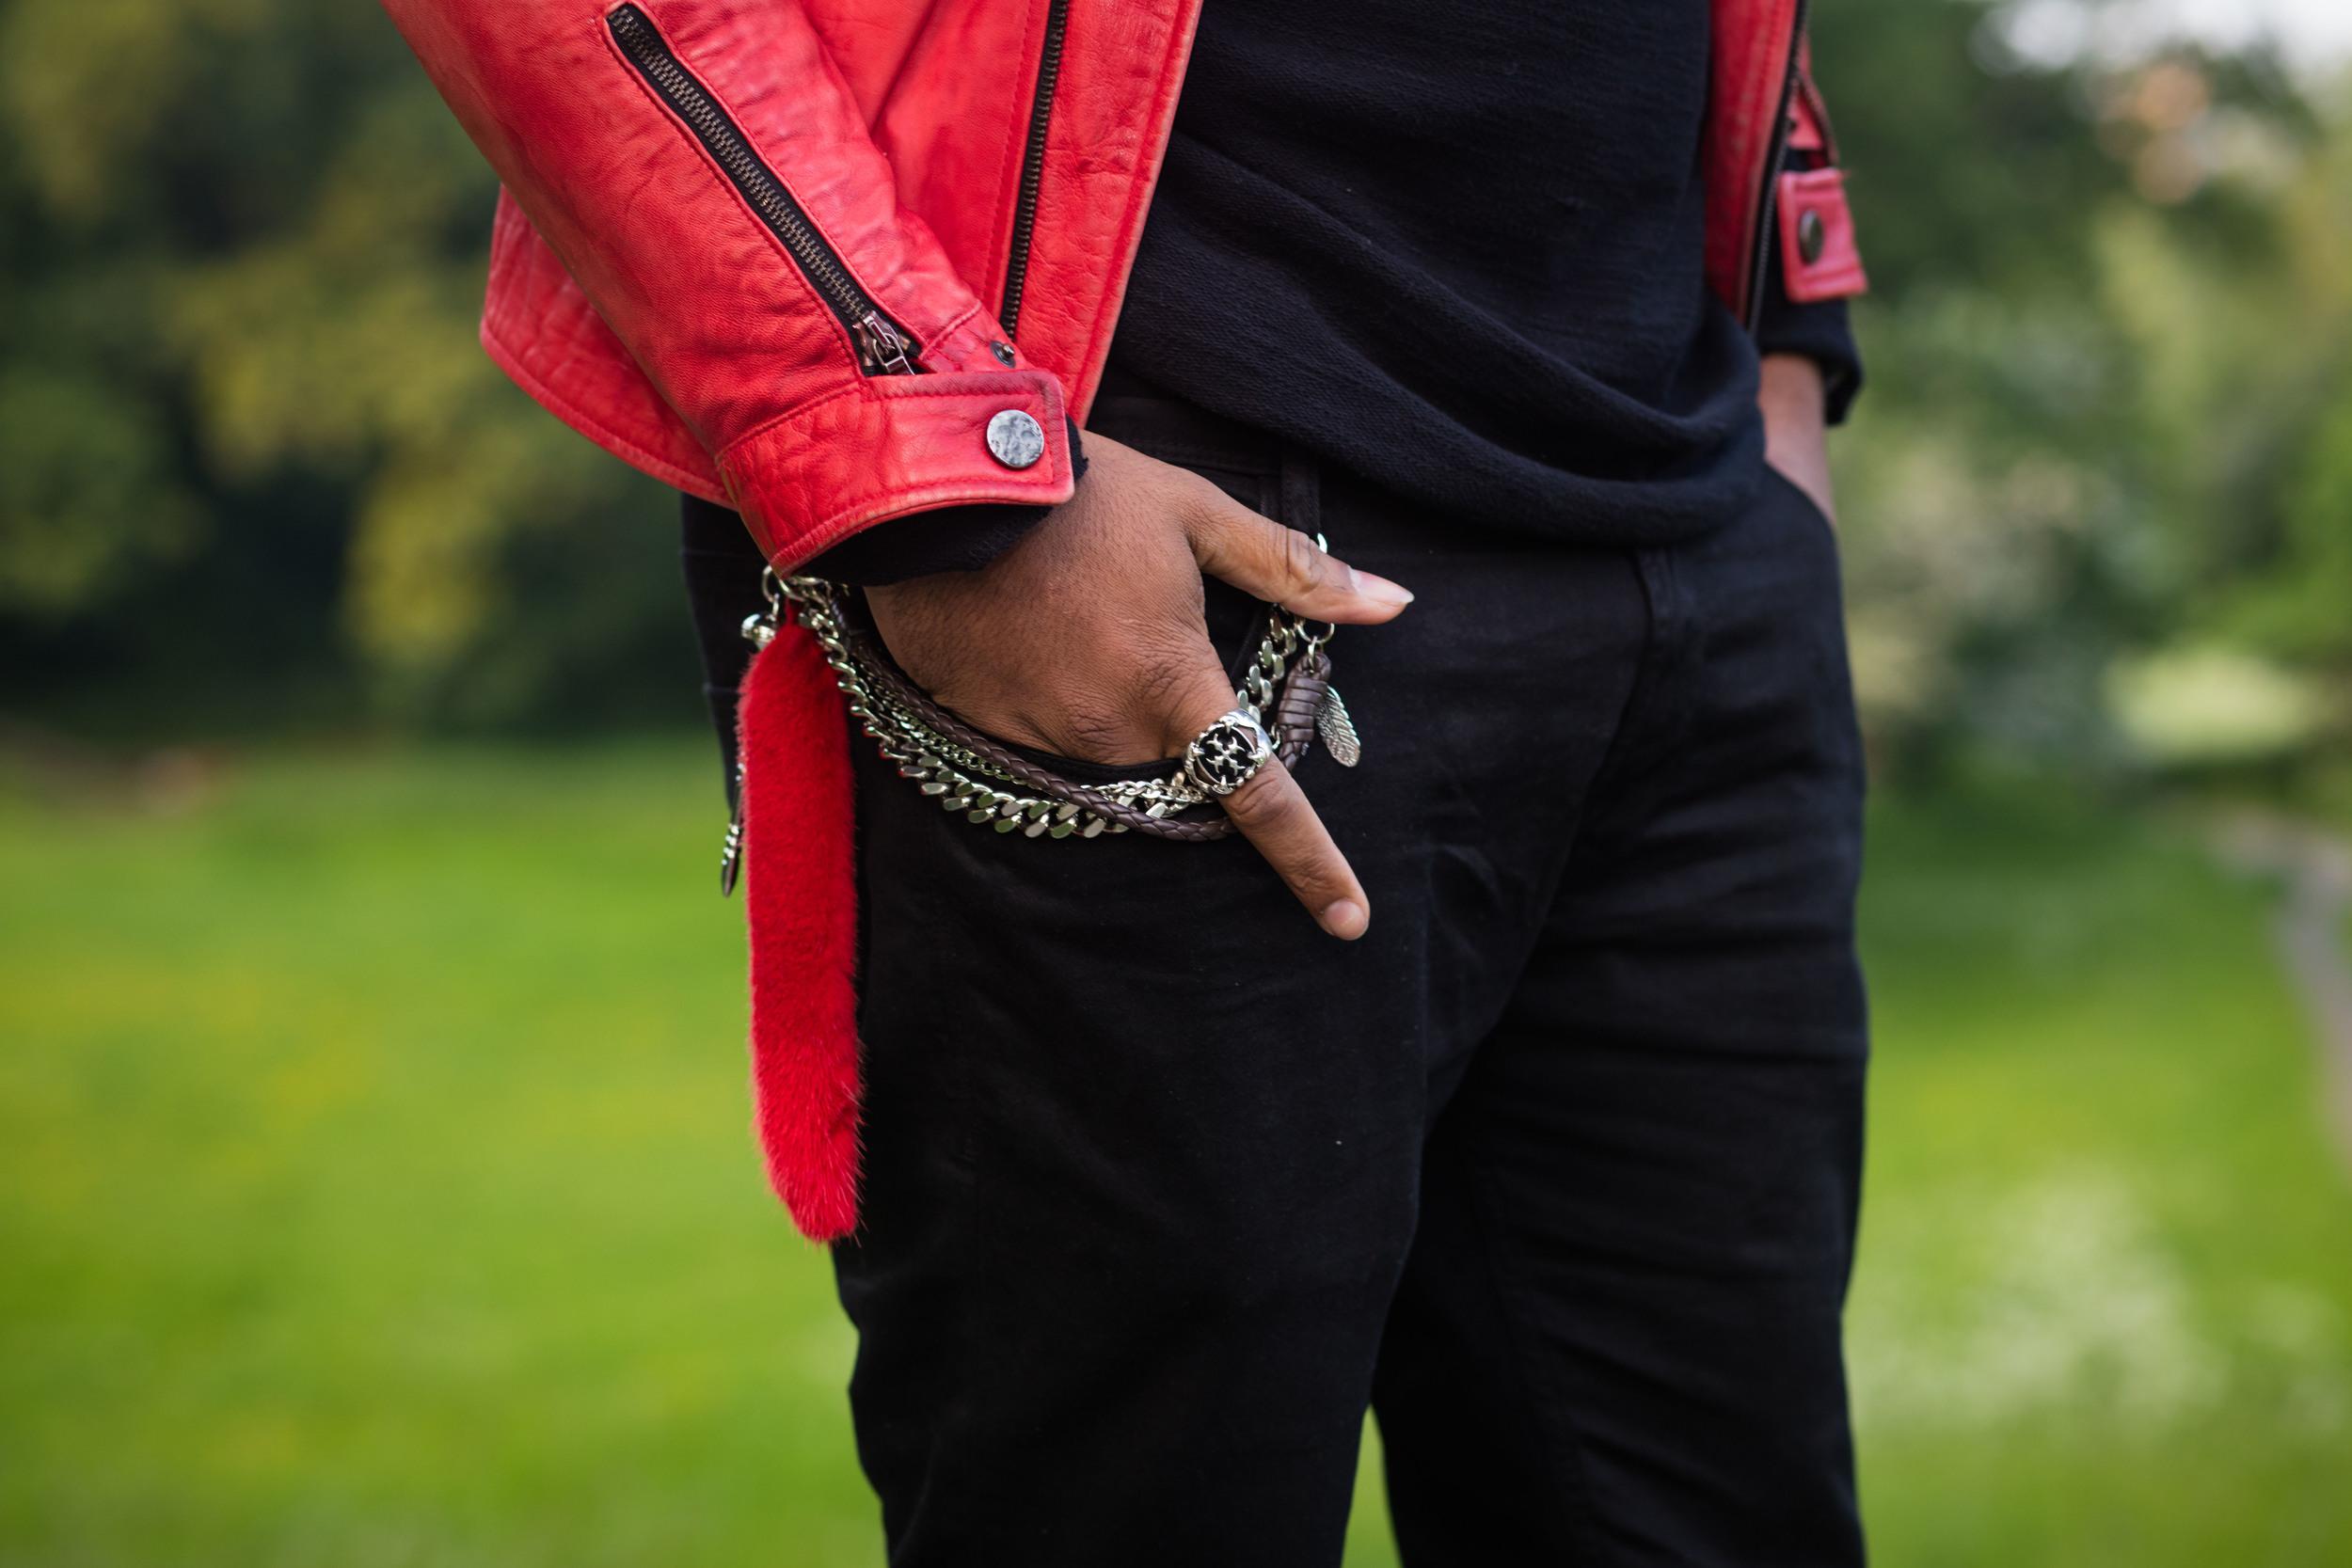 Leather red jacket, Topshop,Asos,dolce Red leather jacket, Sug Sean. Ukblogger